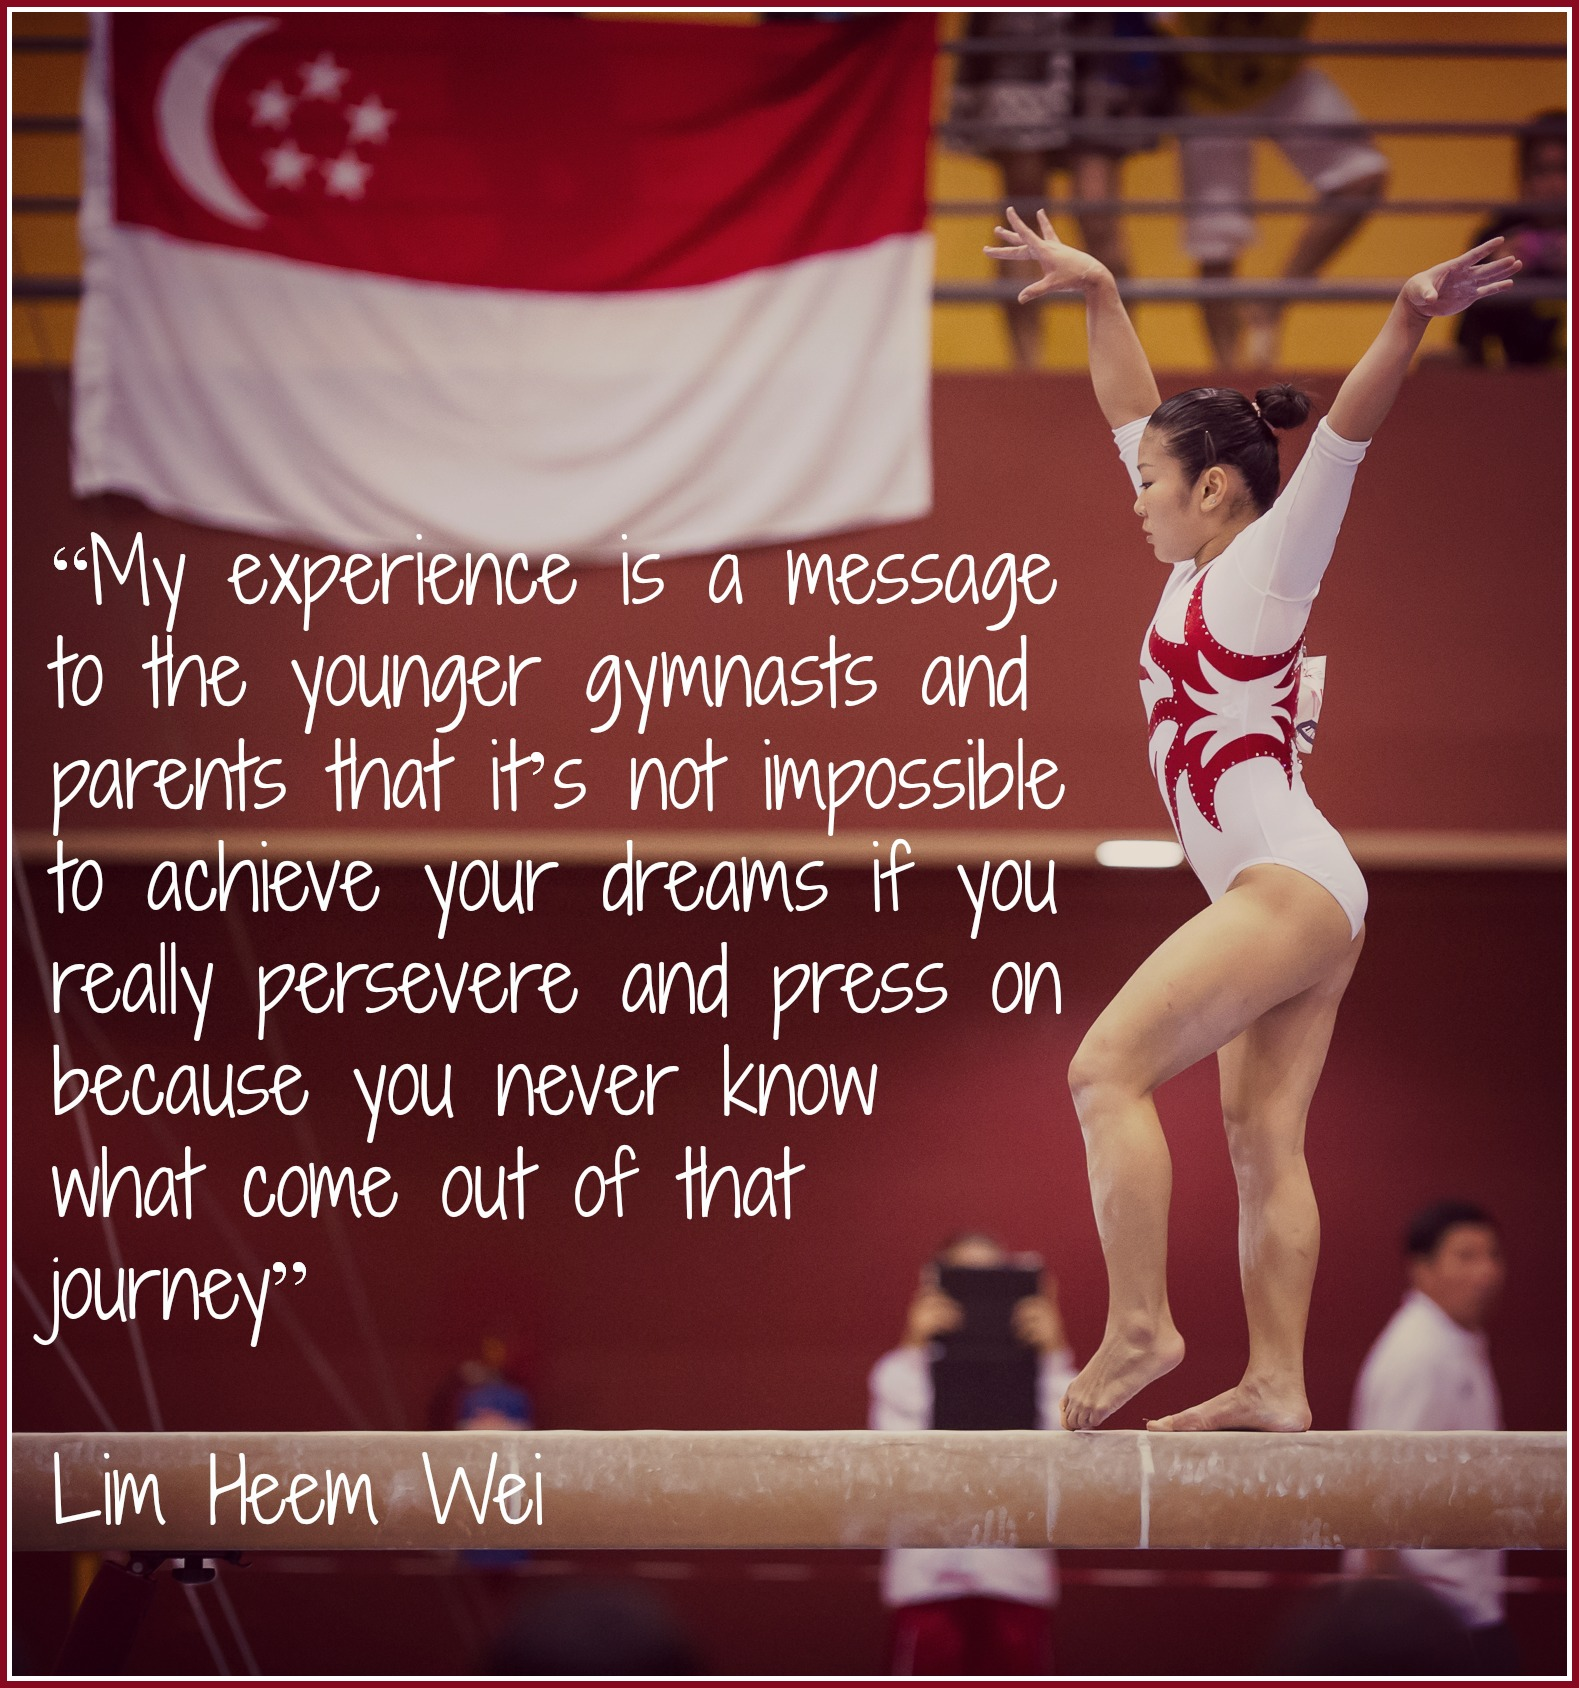 Inspirational Quotes On Pinterest: Inspirational Gymnastics Quotes. QuotesGram